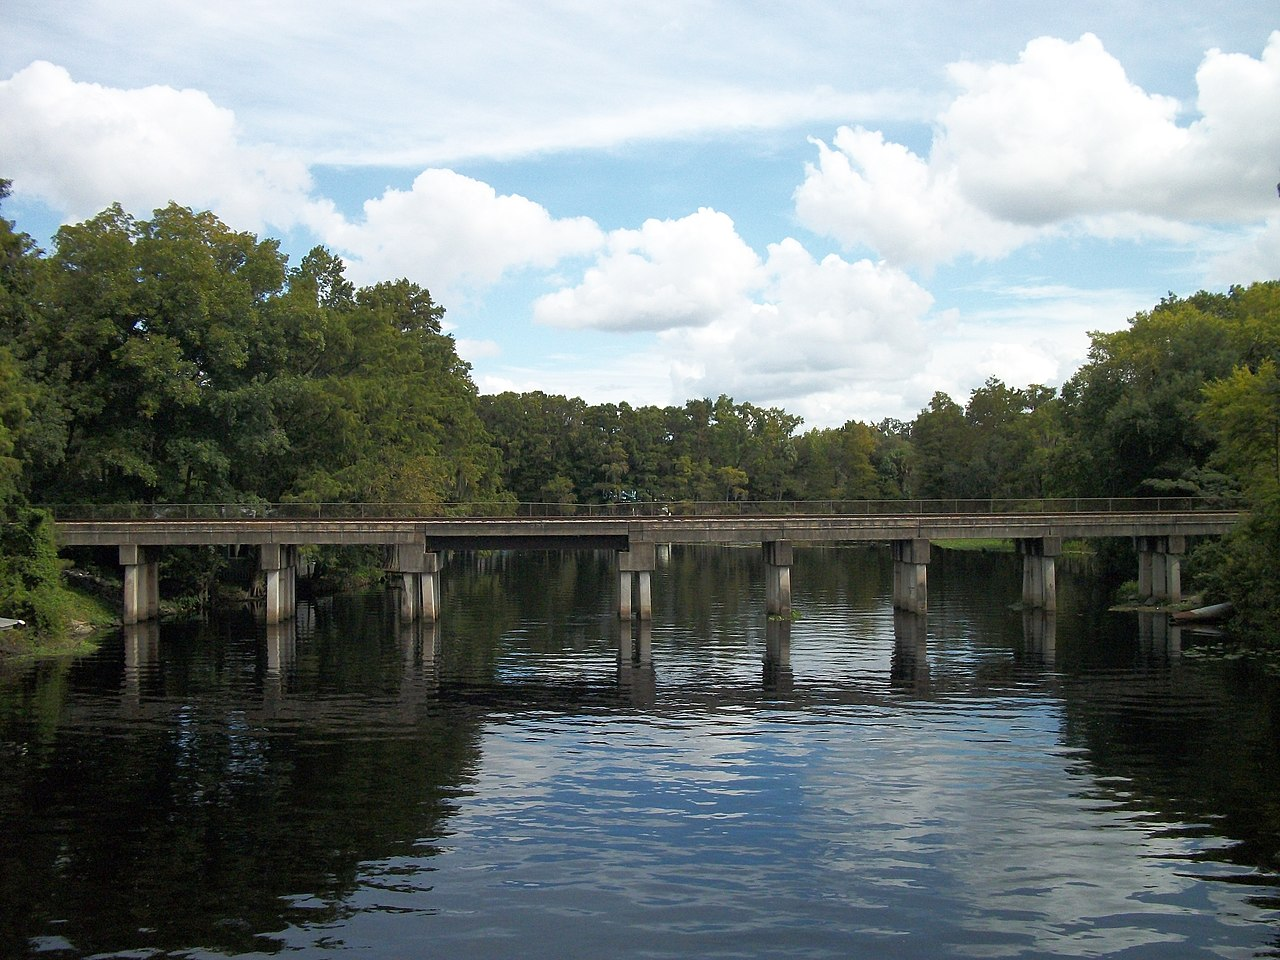 File:US 41 Withlacoochee River Bridge; View of CSX Bridge ...